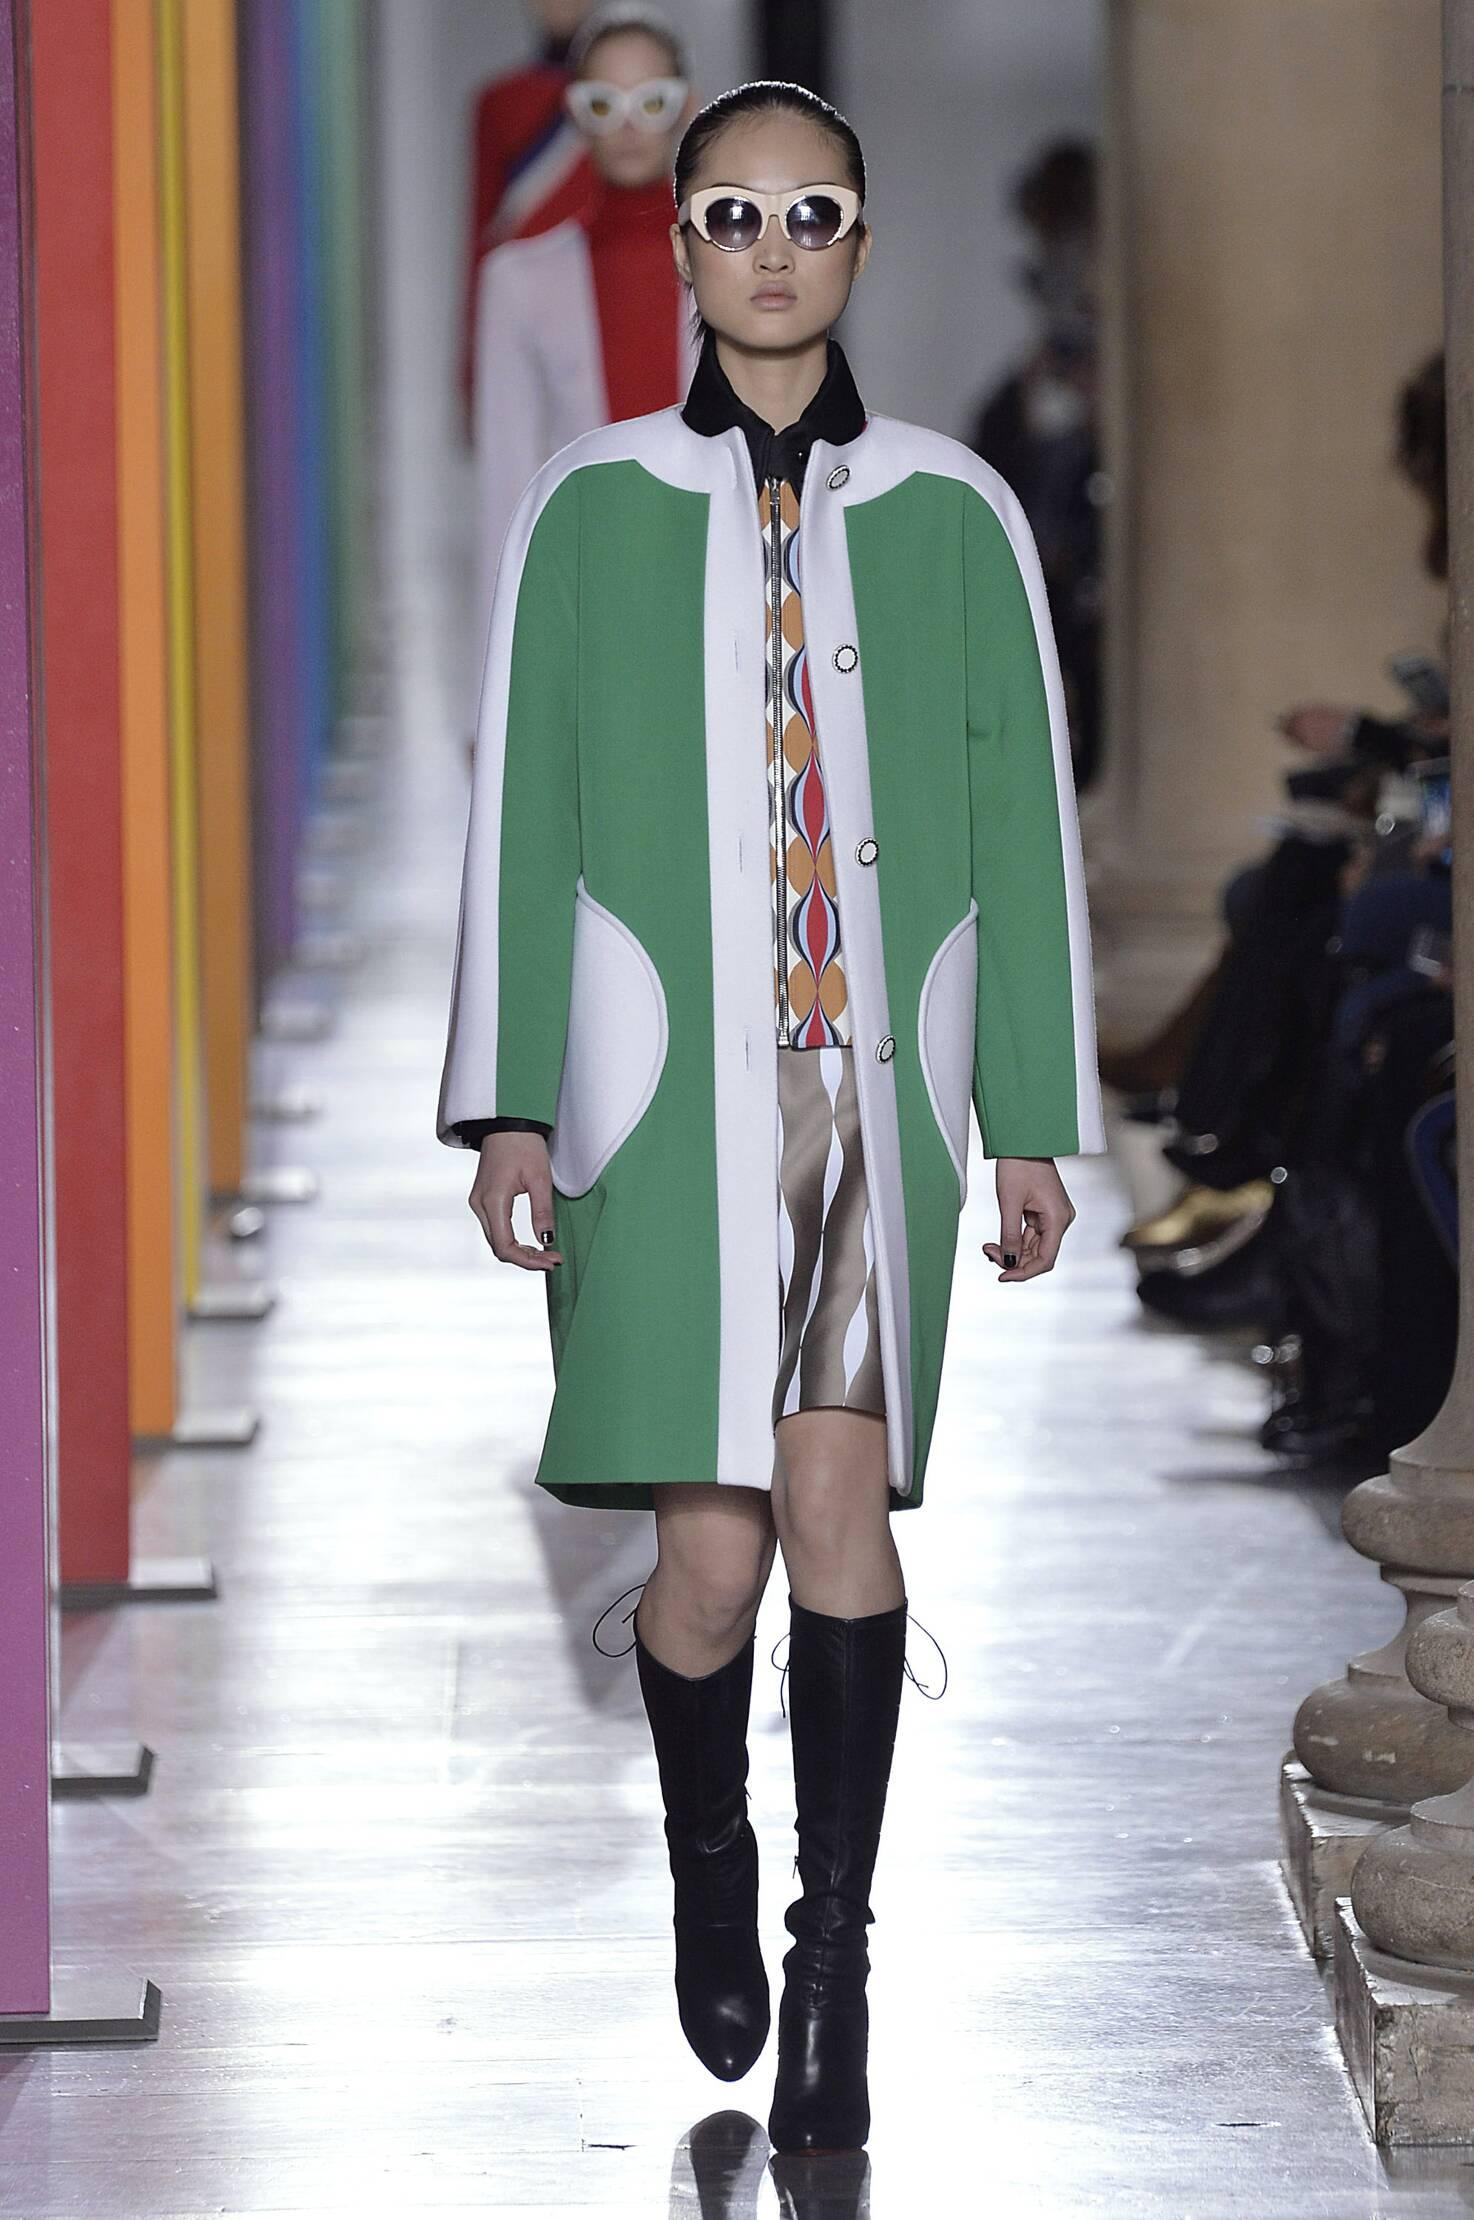 Jonathan Saunders Collection Woman London Fashion Week